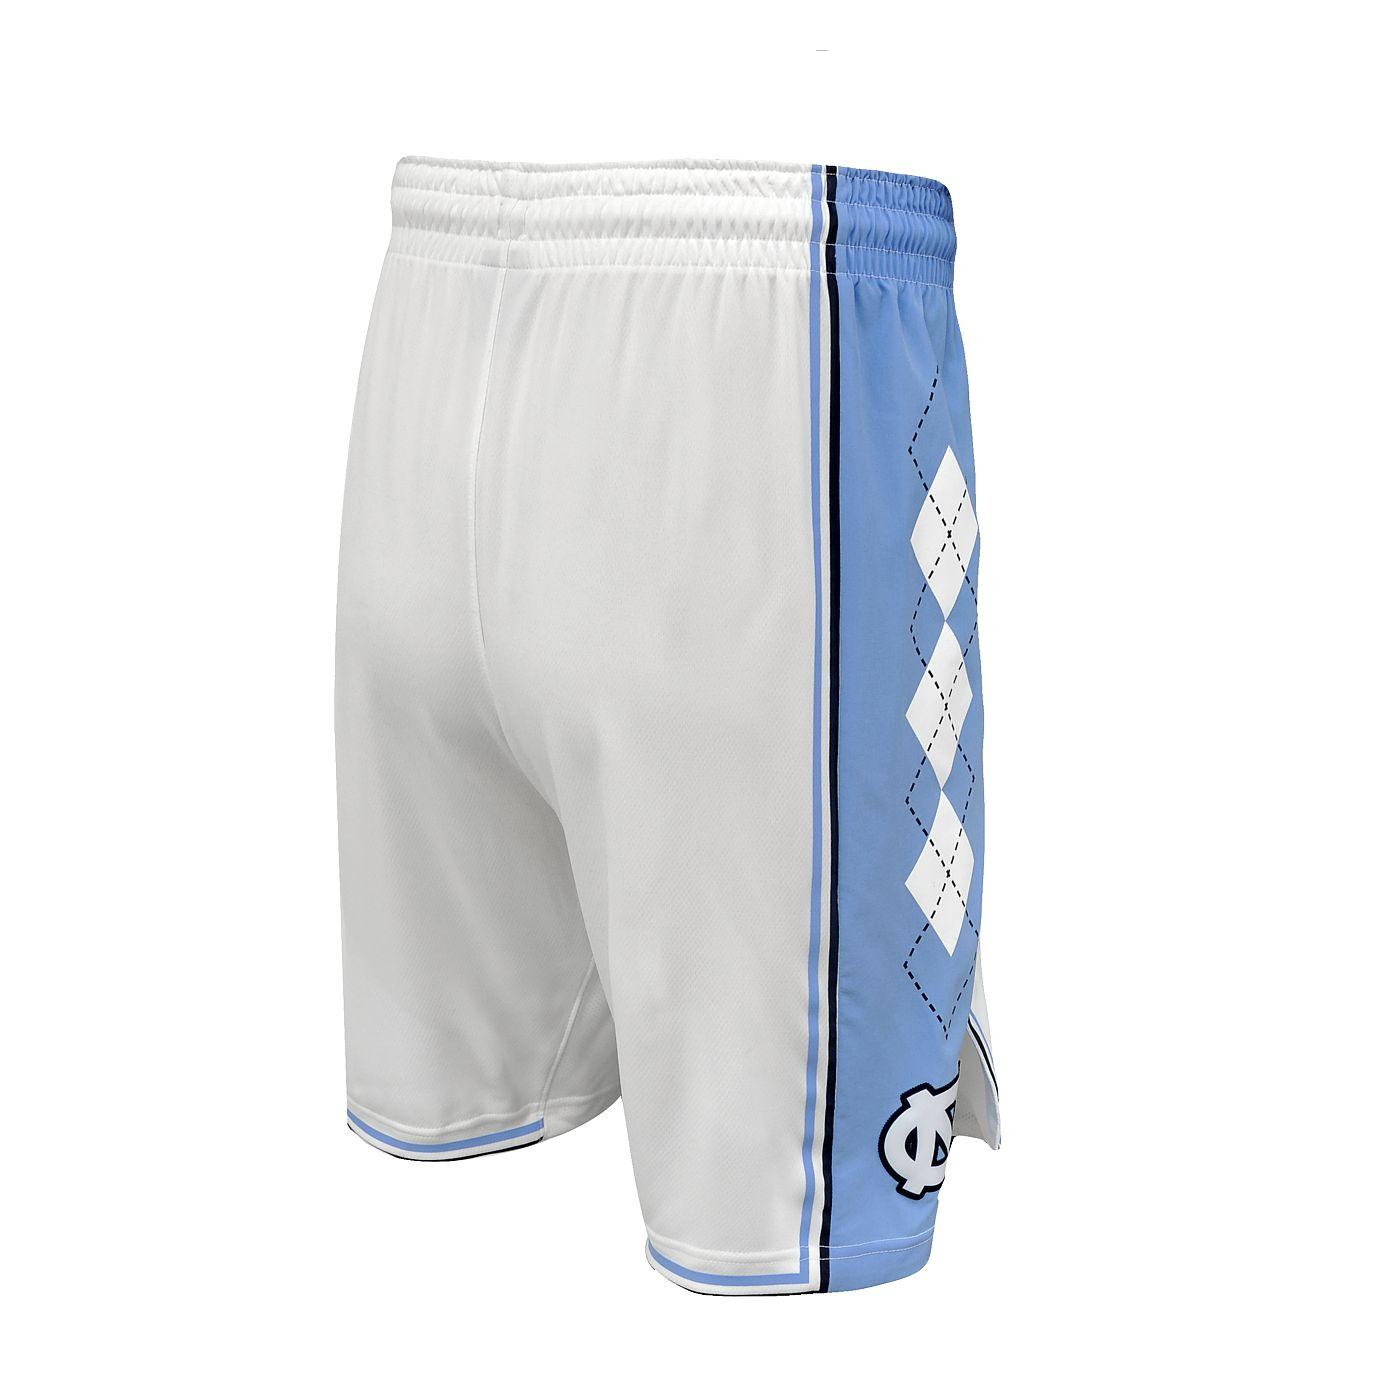 6345b28d19 Johnny T-shirt - North Carolina Tar Heels - Nike Authentic Basketball  Shorts (White) by Nike